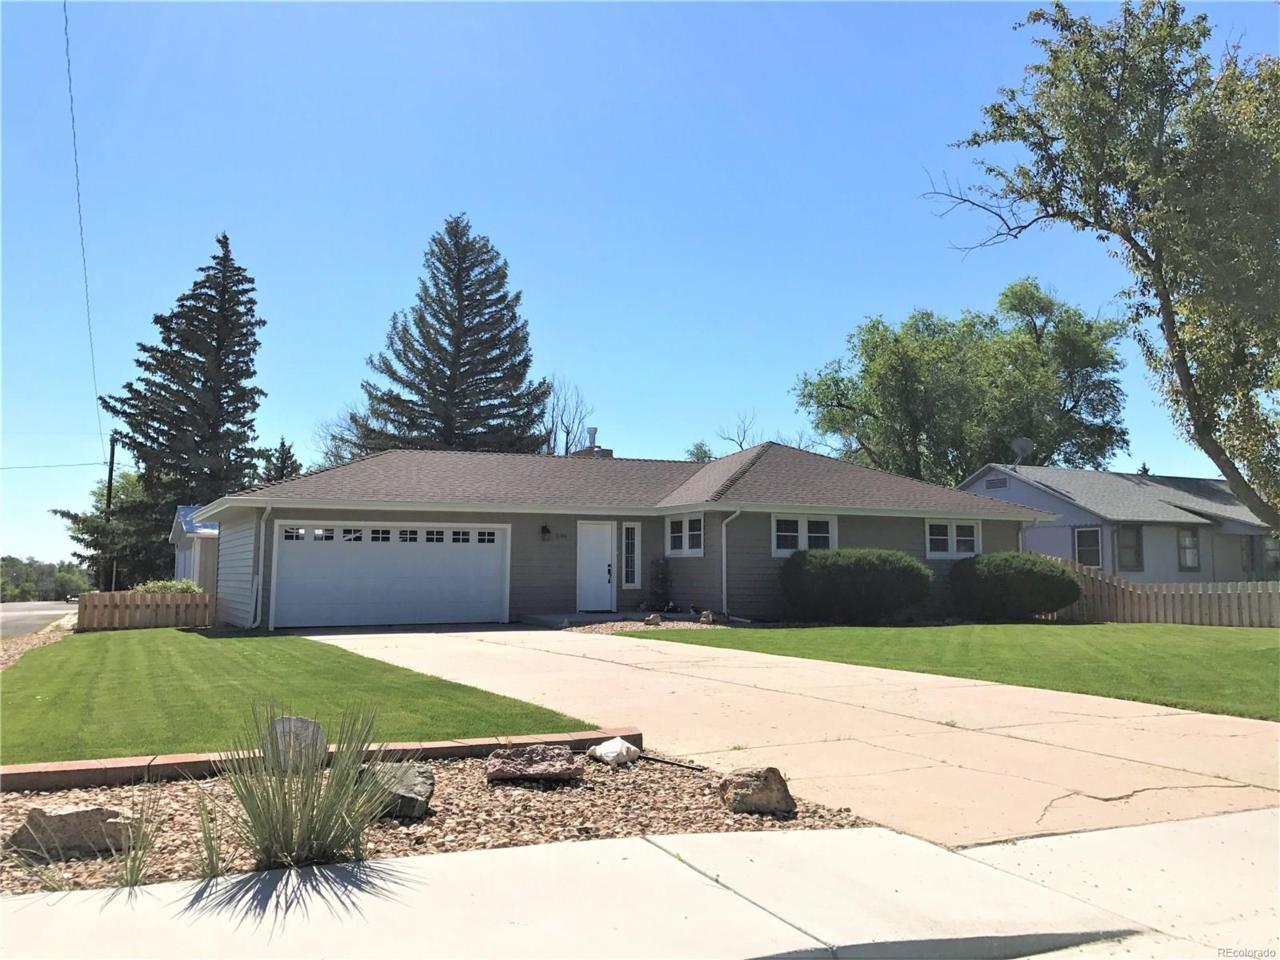 598 K Avenue, Limon, CO 80828 (MLS #4272913) :: 8z Real Estate